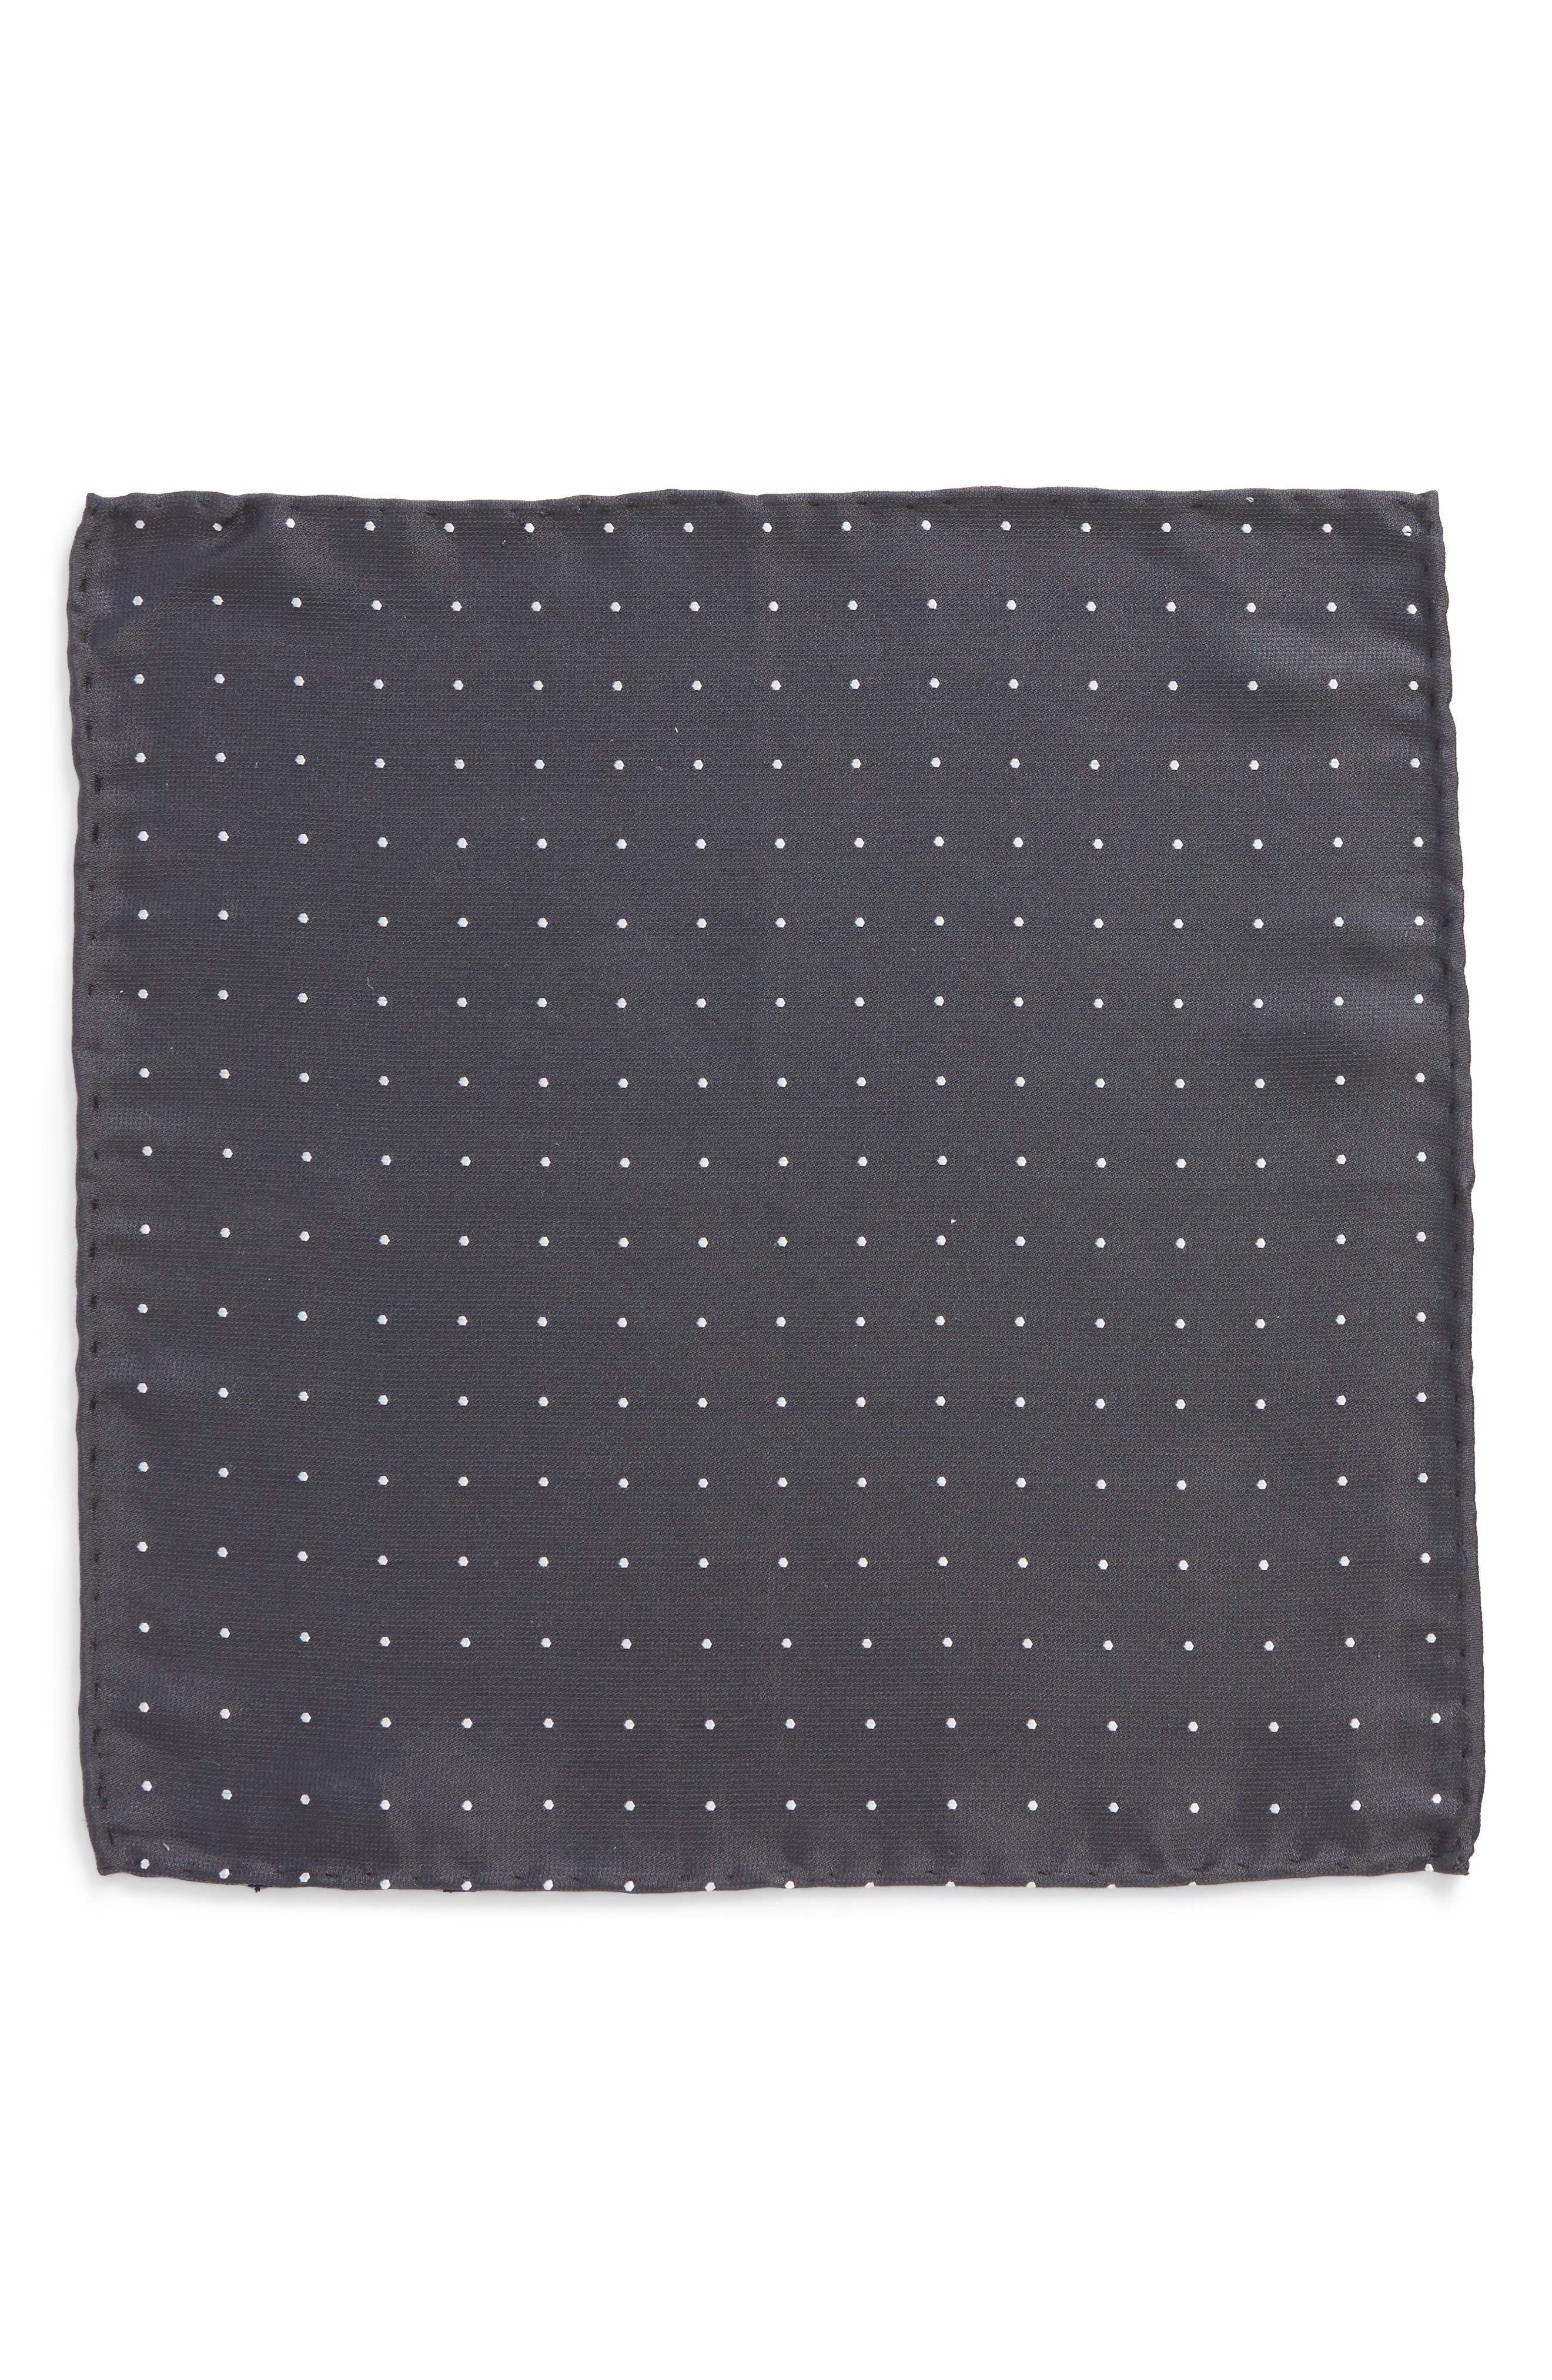 Dot Silk Pocket Square,                             Alternate thumbnail 2, color,                             Charcoal